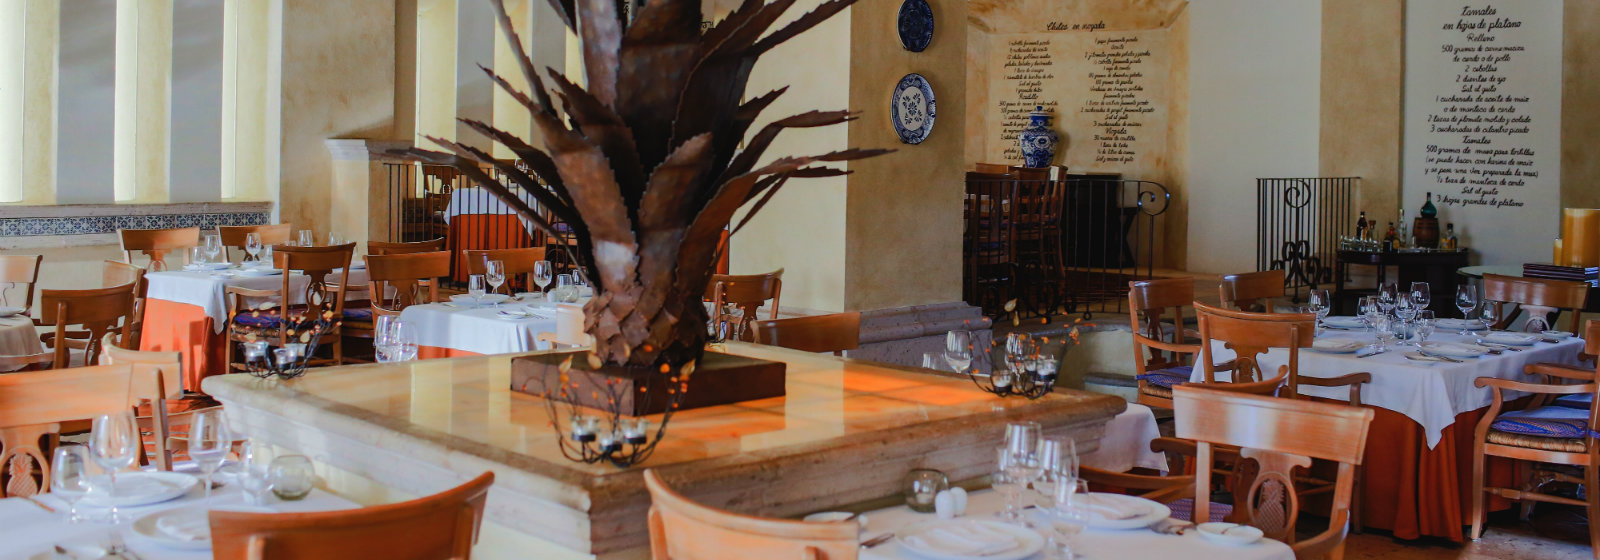 Restaurante Mexicano Frida en Grand Velas Riviera Nayarit